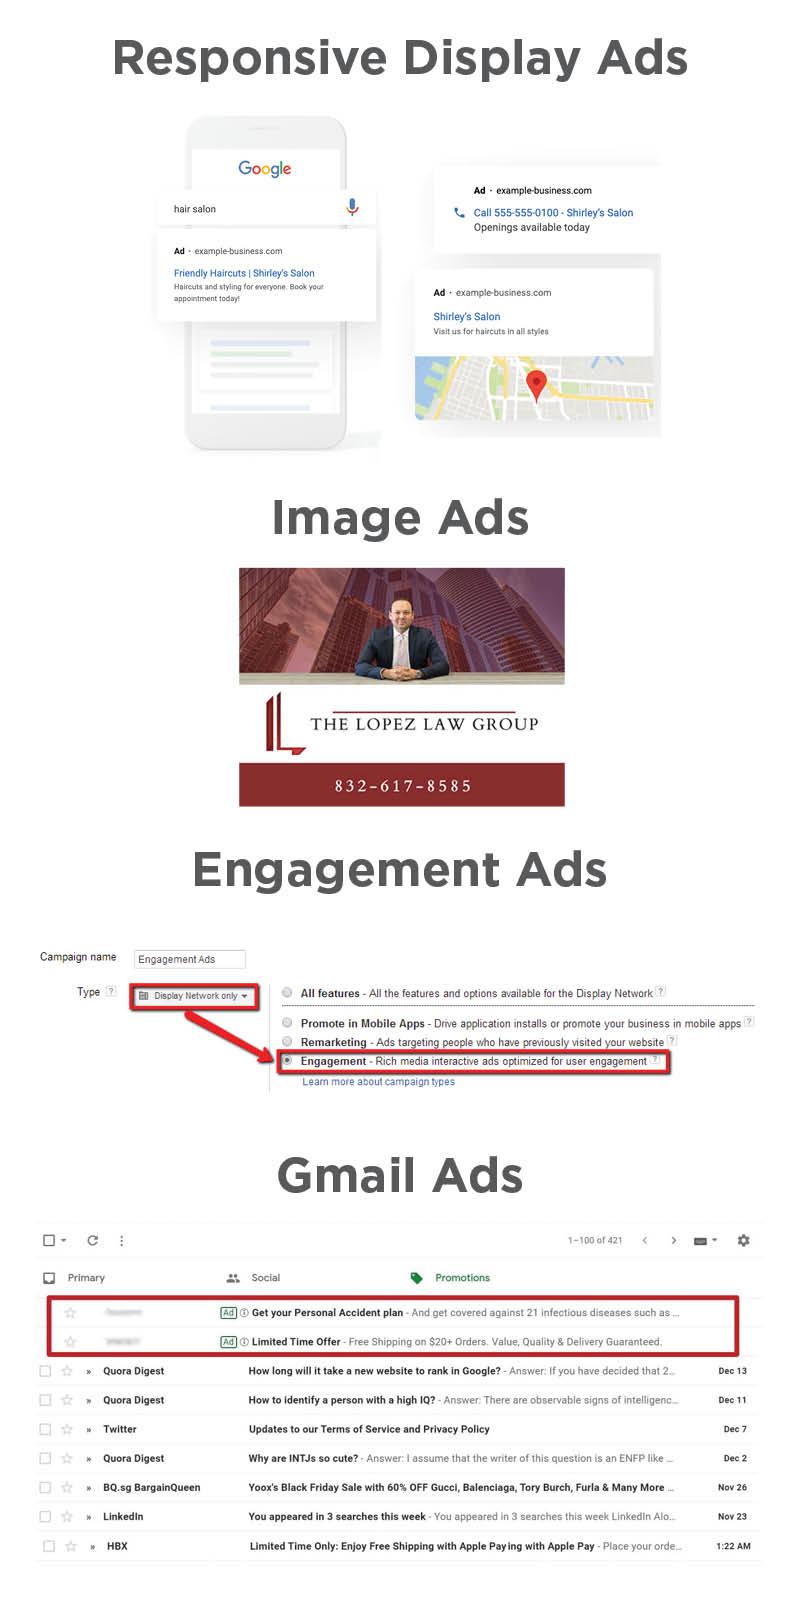 6. PPC-Google Ads Network